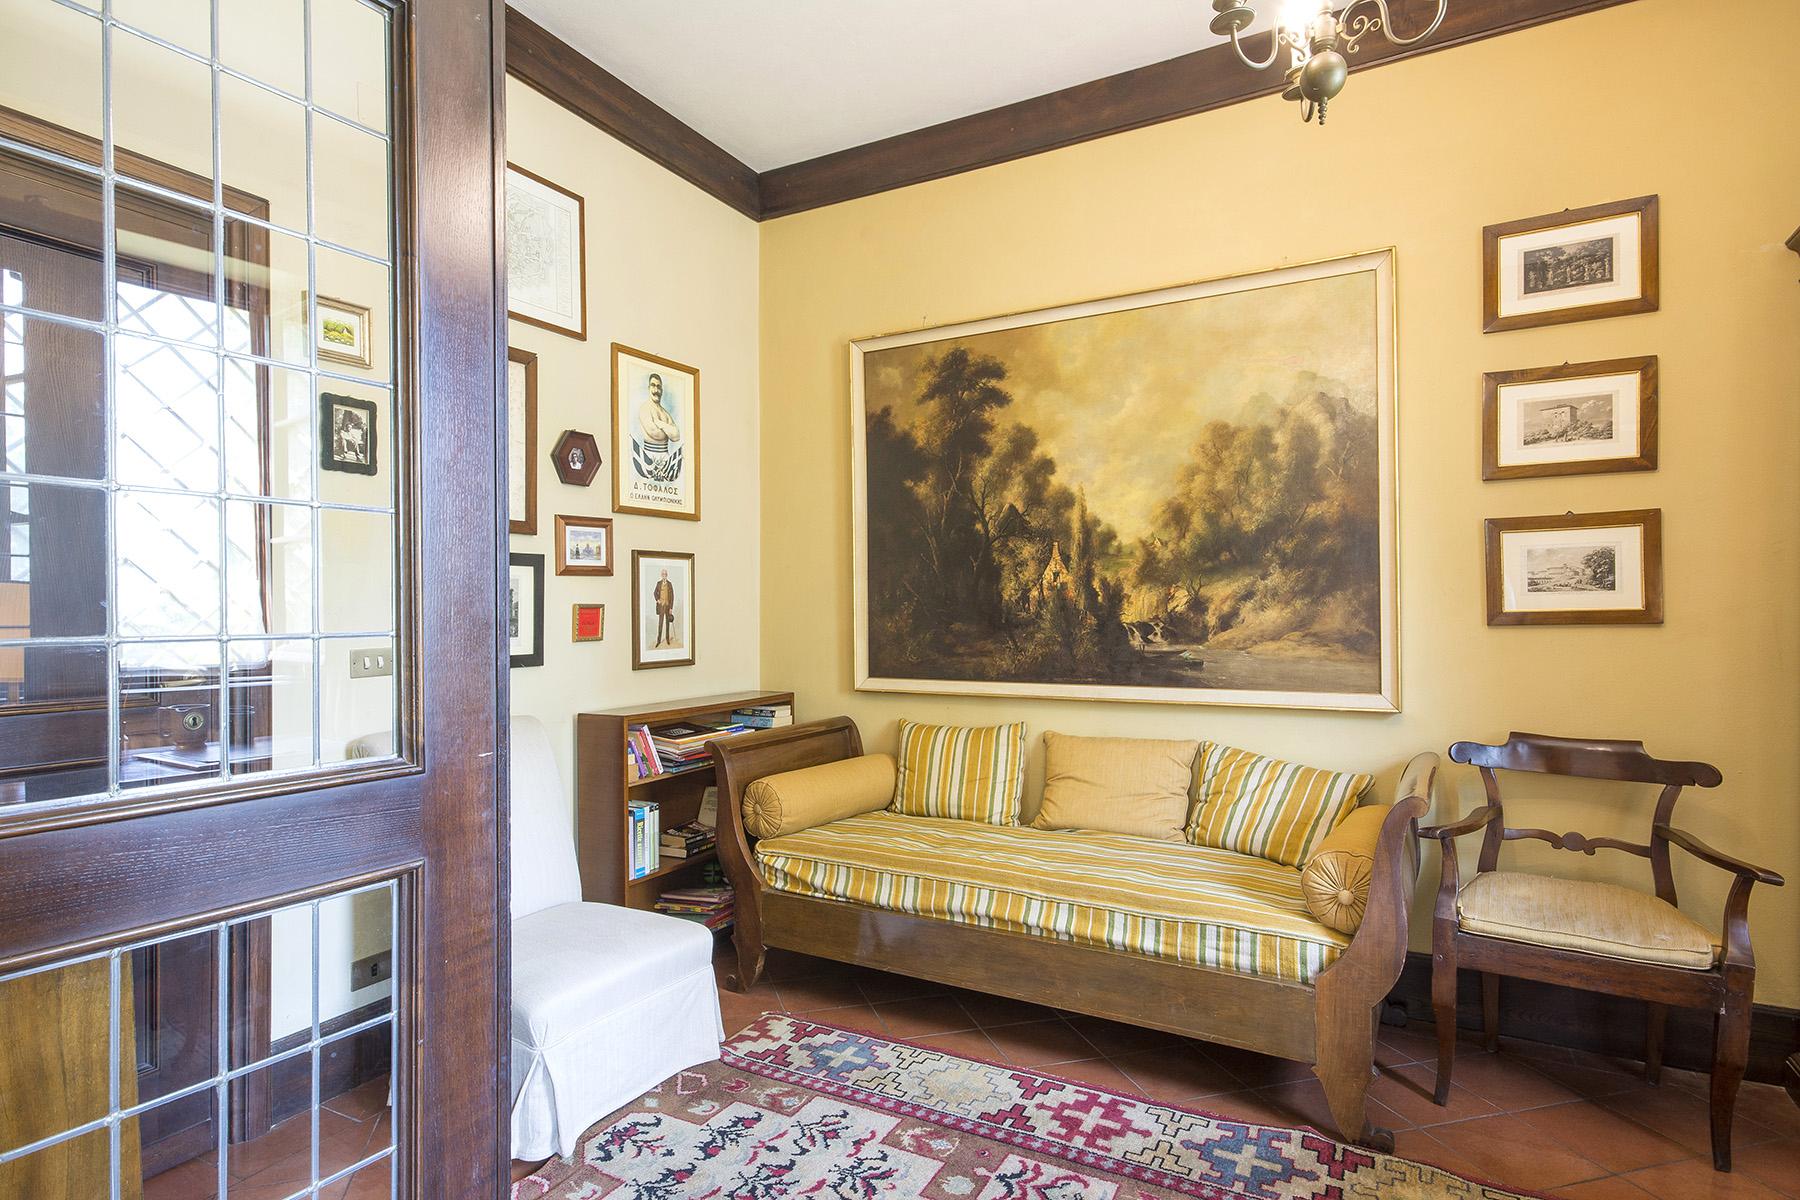 Villa in Vendita a Lucca: 5 locali, 600 mq - Foto 11